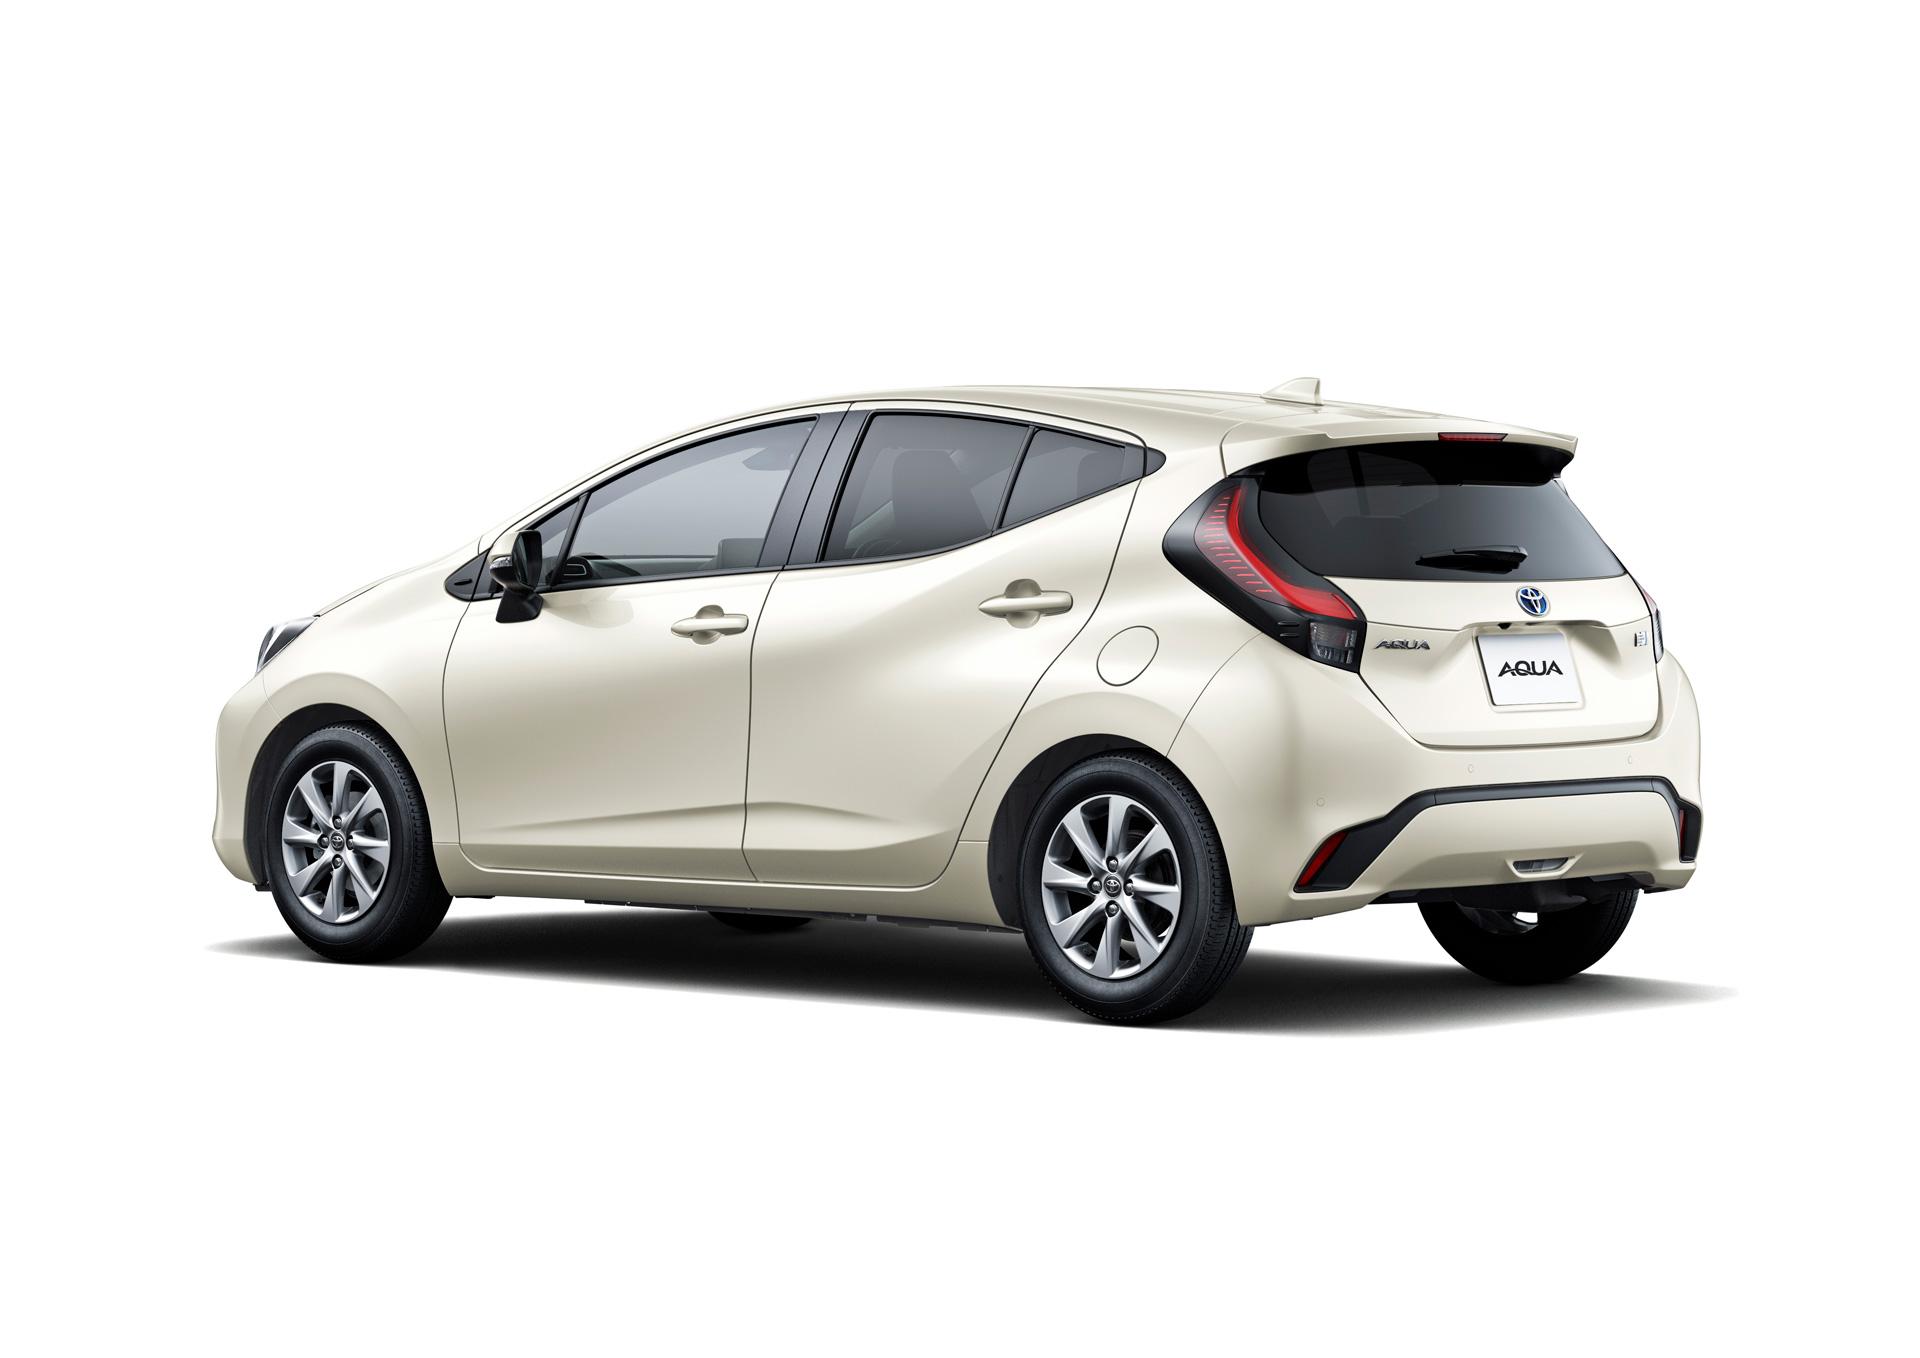 Toyota to Launch All-New Aqua - Image 7